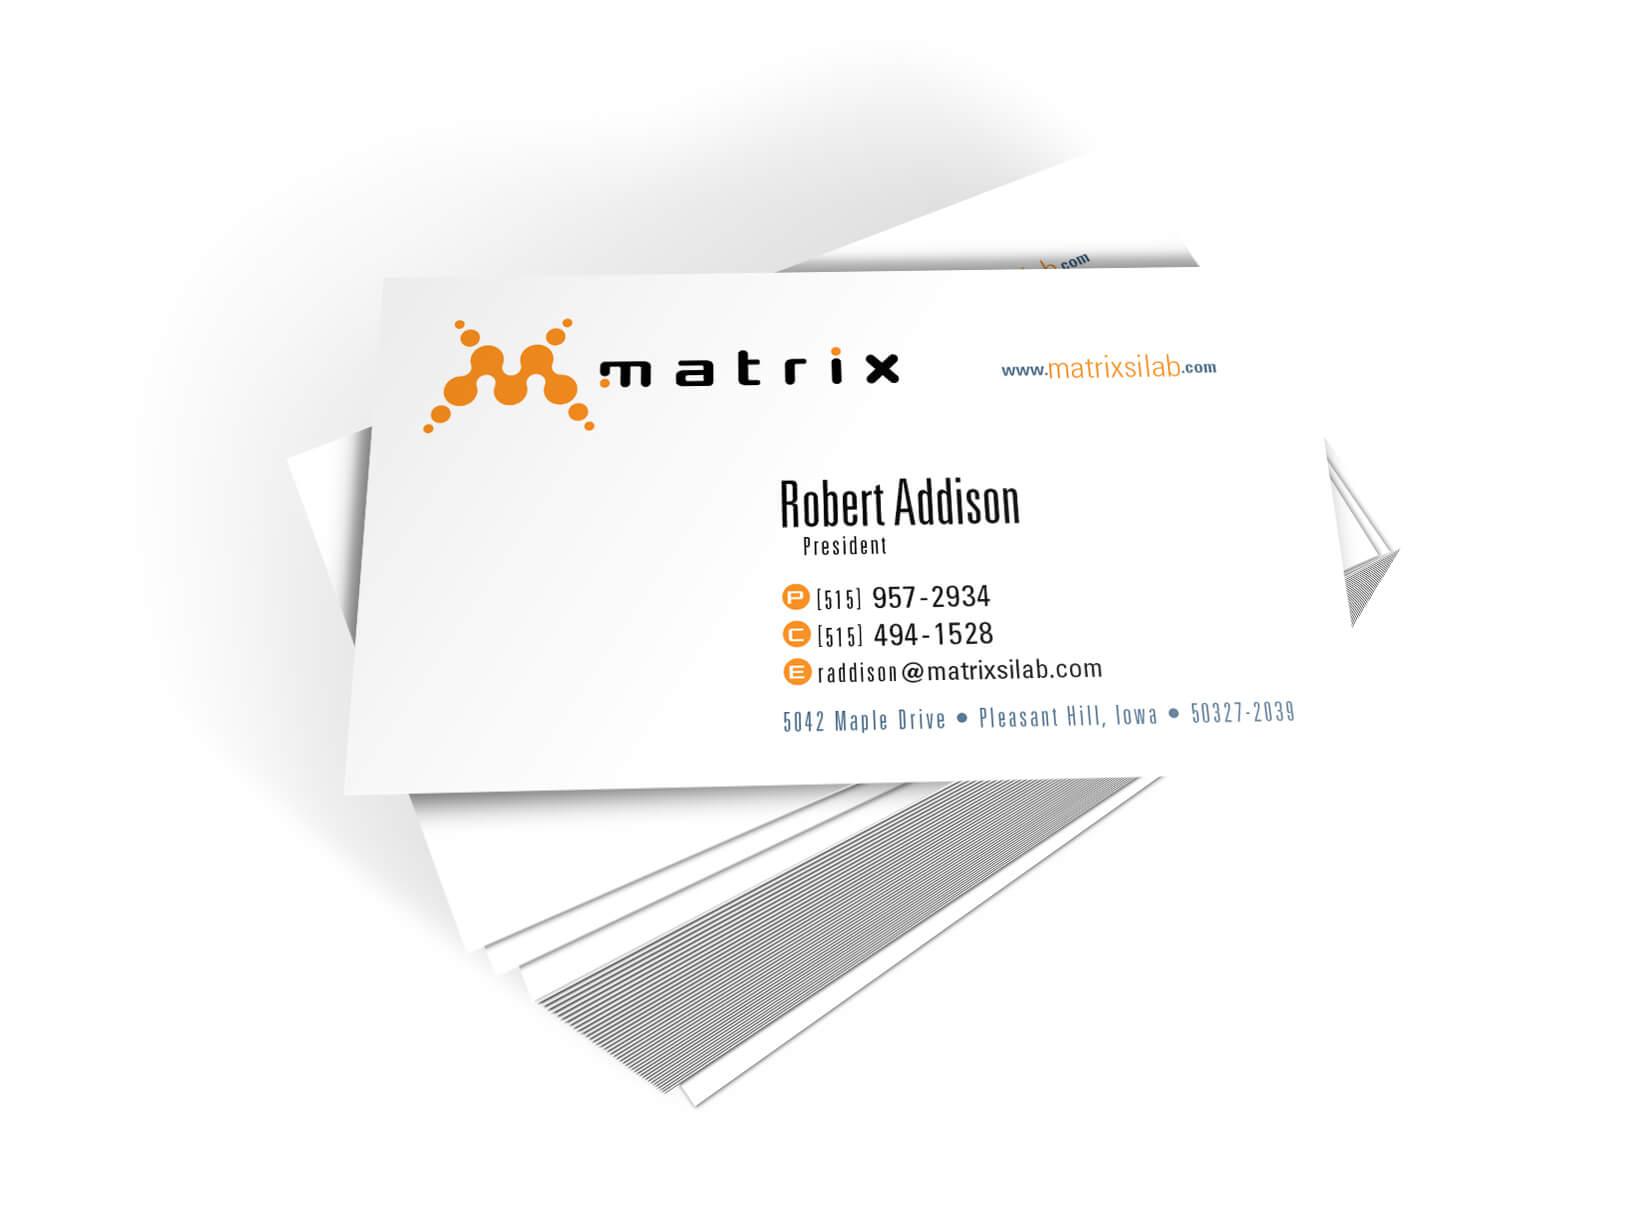 Matrix Business Cards